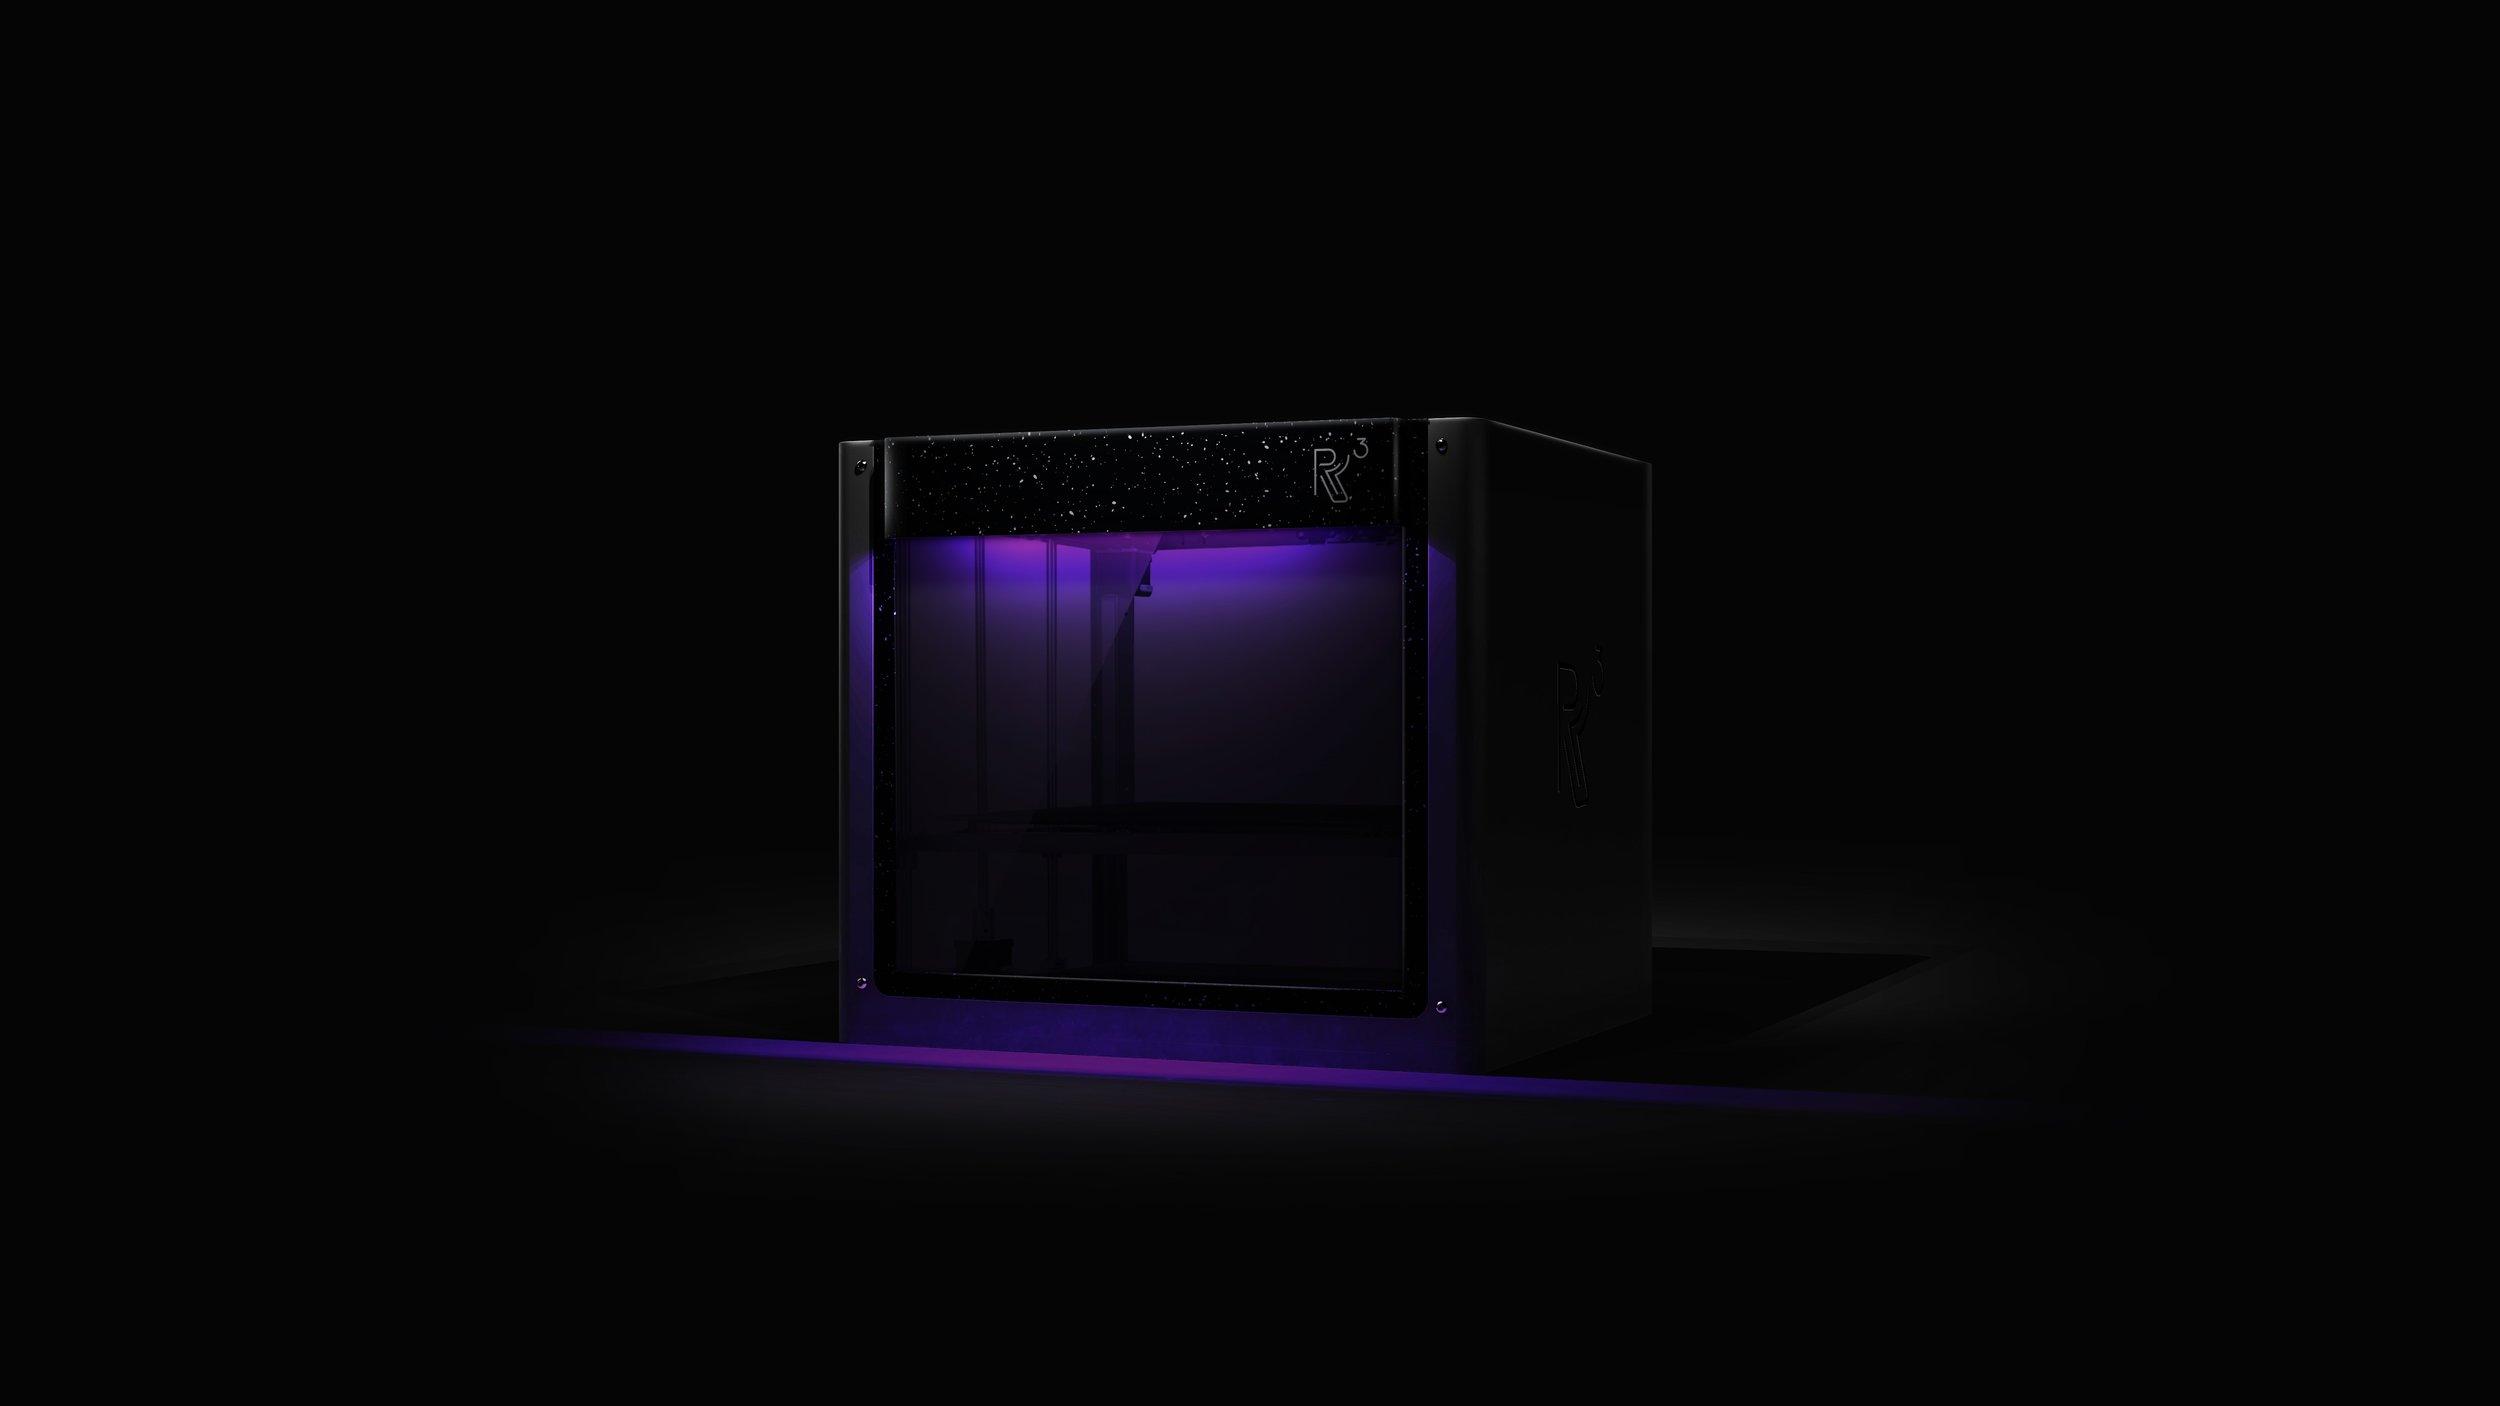 R3Printer_DarkMode_Light_Purple - For Press Kit.jpg